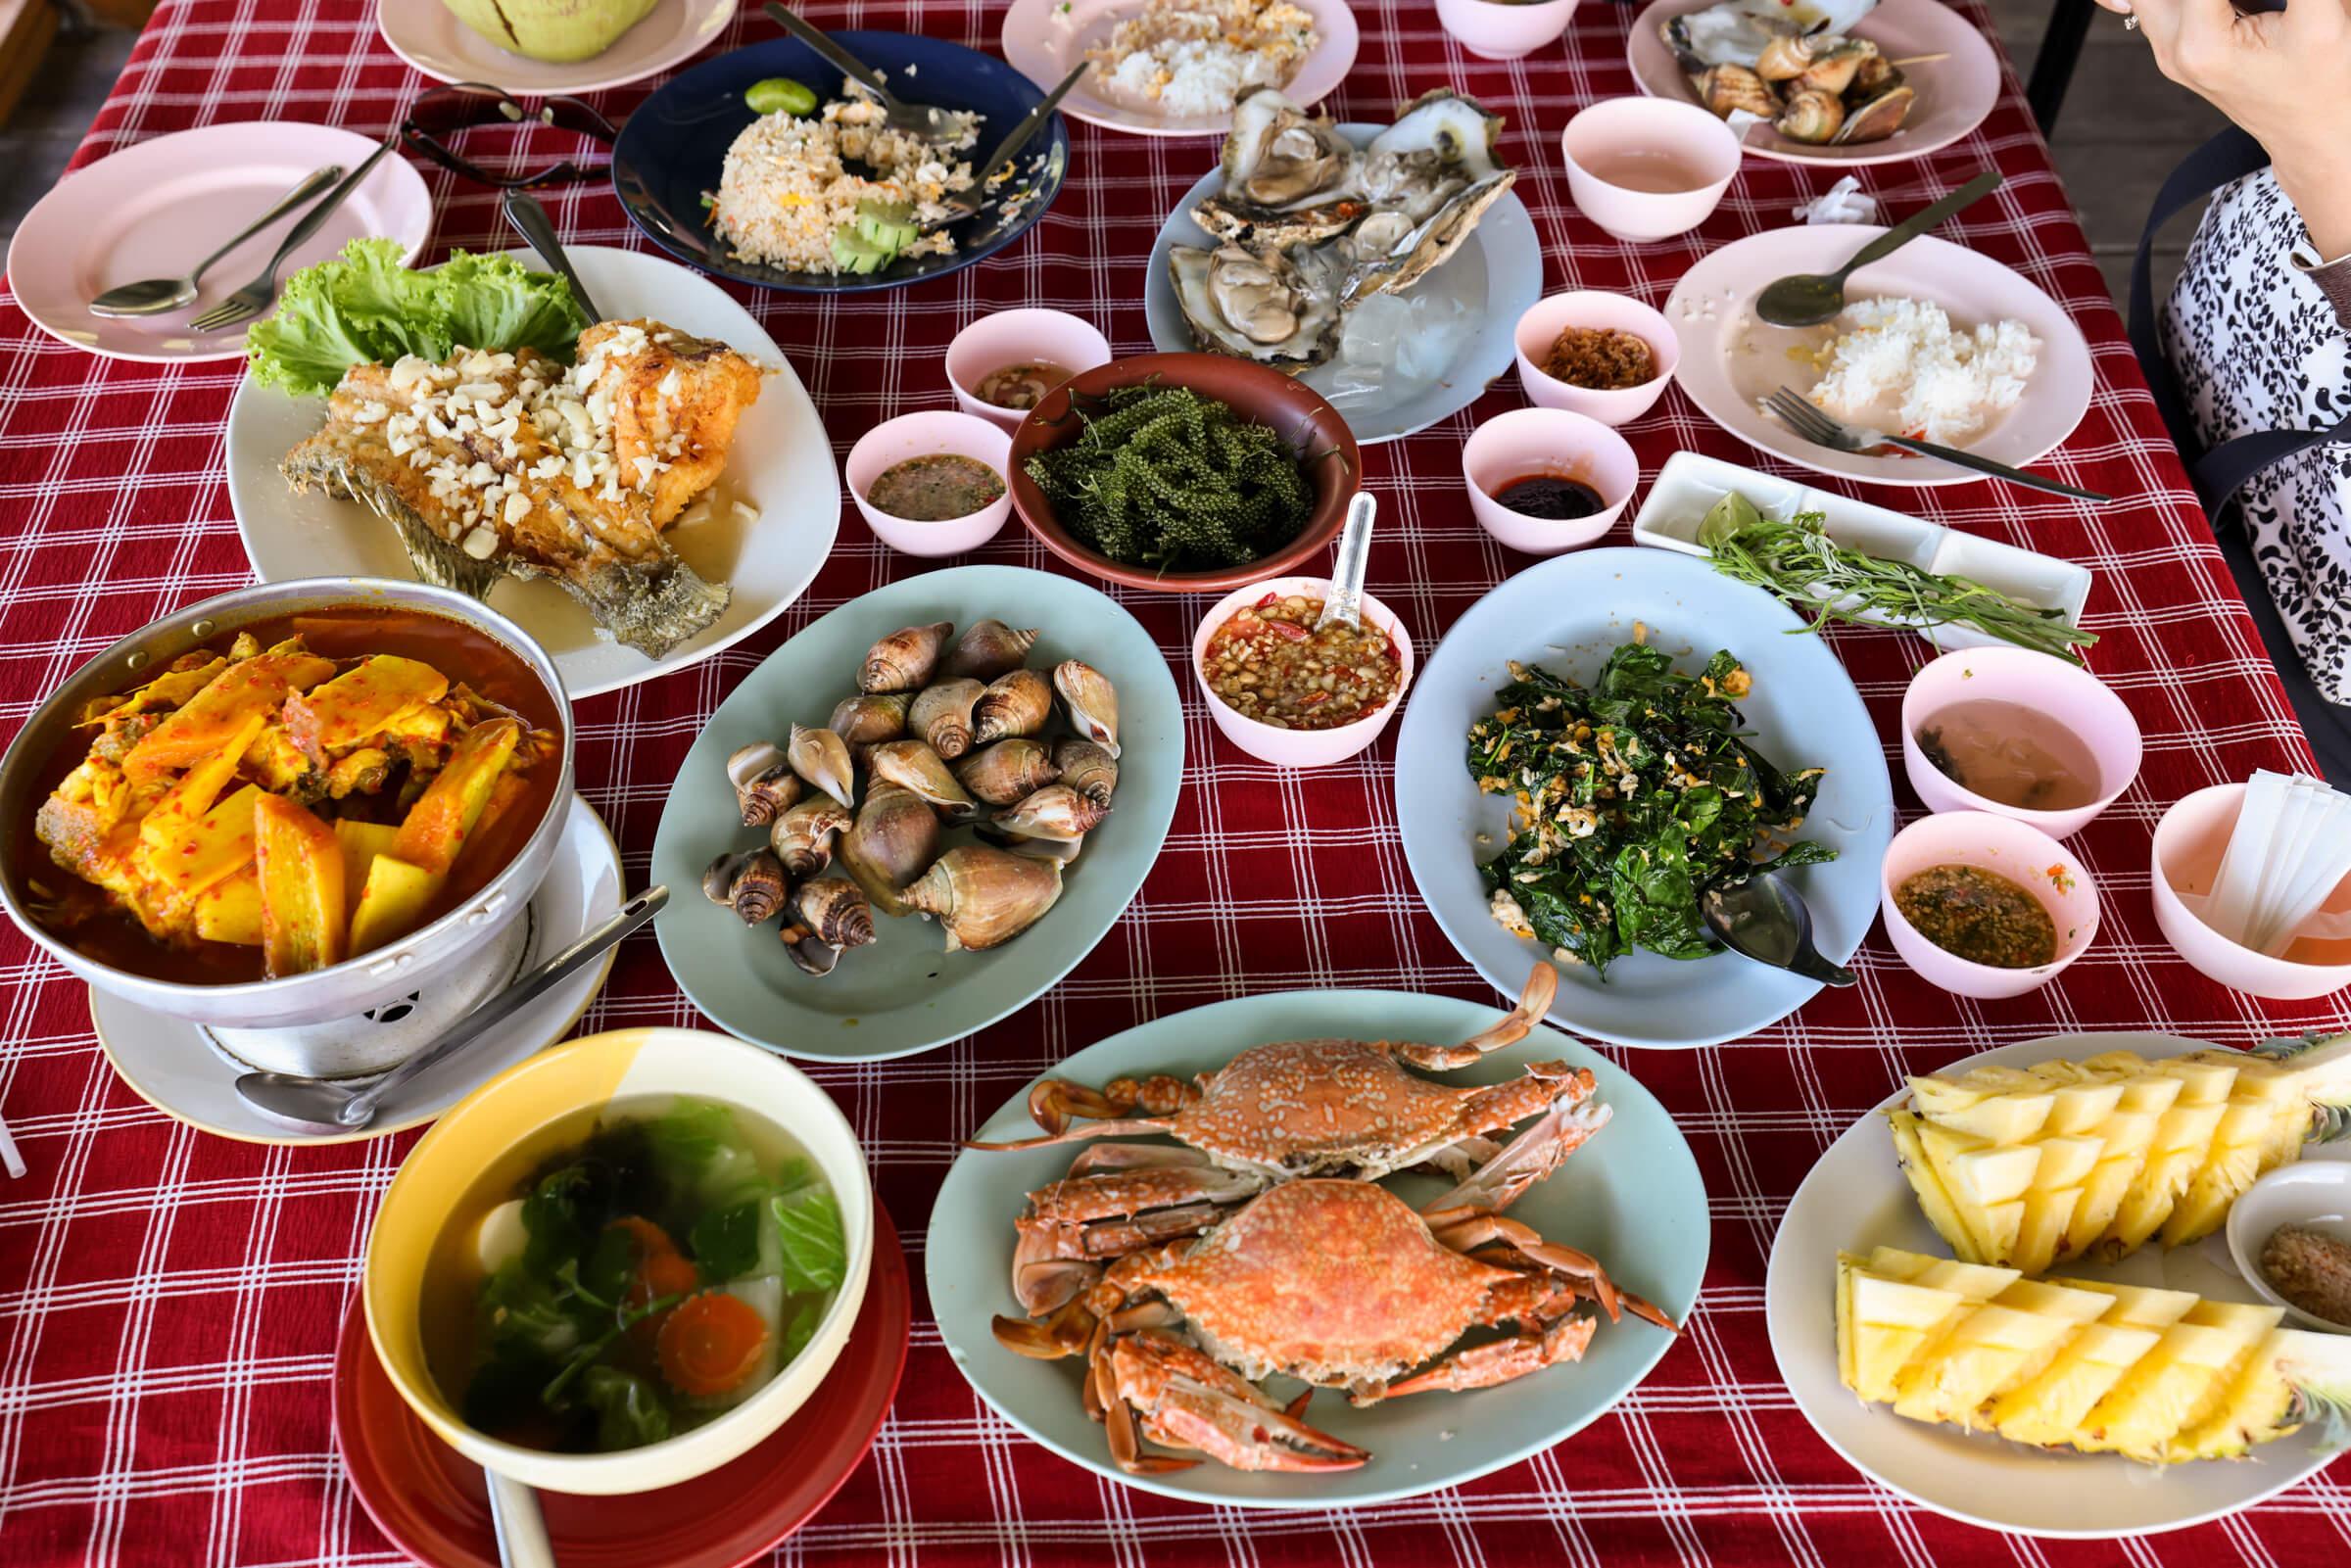 Laem Sai Seafood (แหลมทรายซีฟู้ดส์)